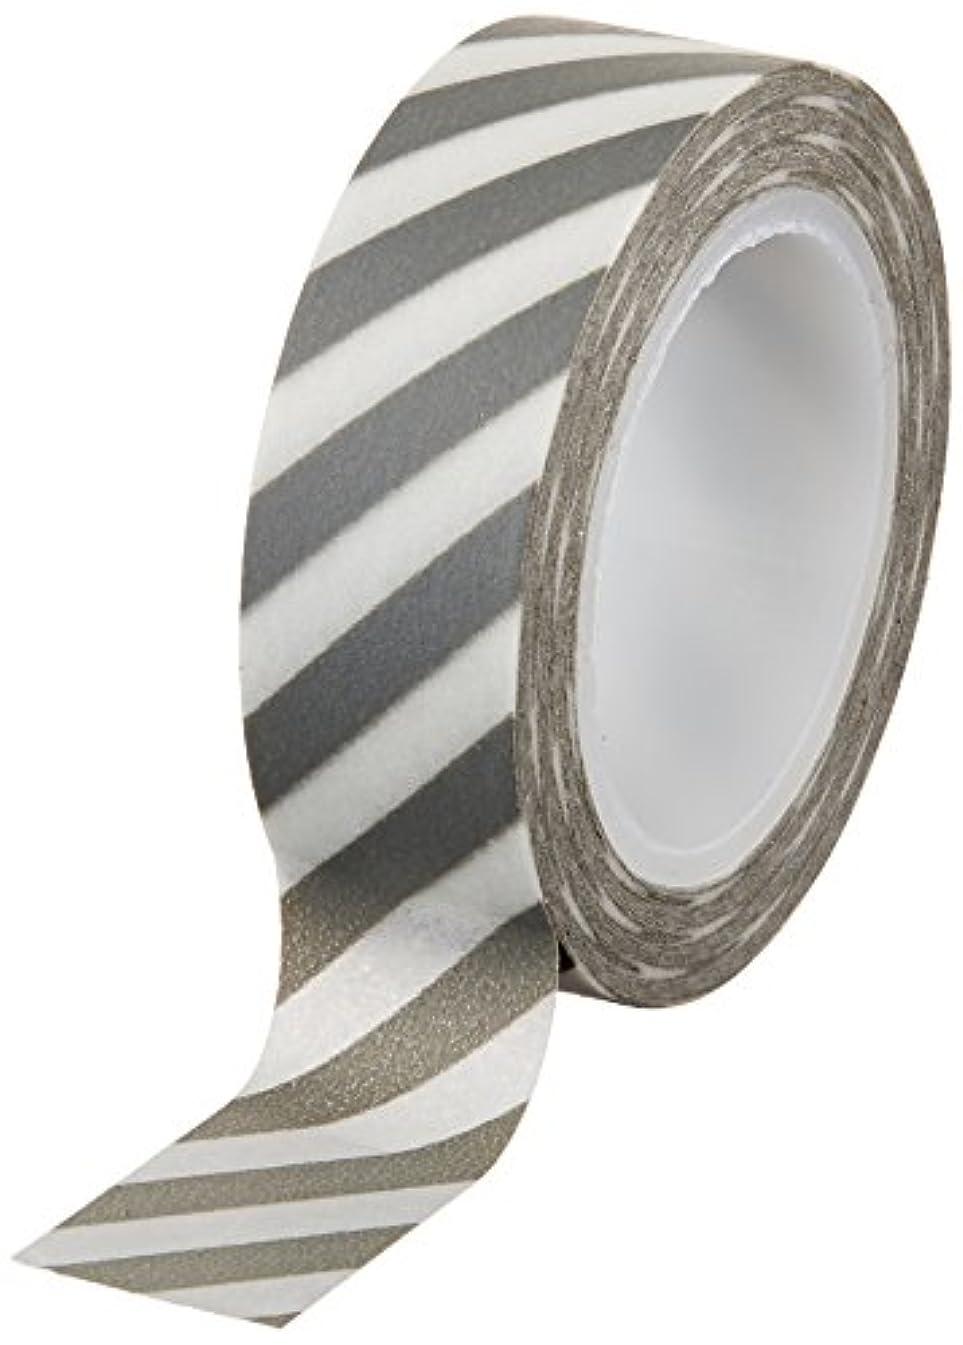 Wrapables Striped Japanese Washi Masking Tape, Diagonal Grey Stripe